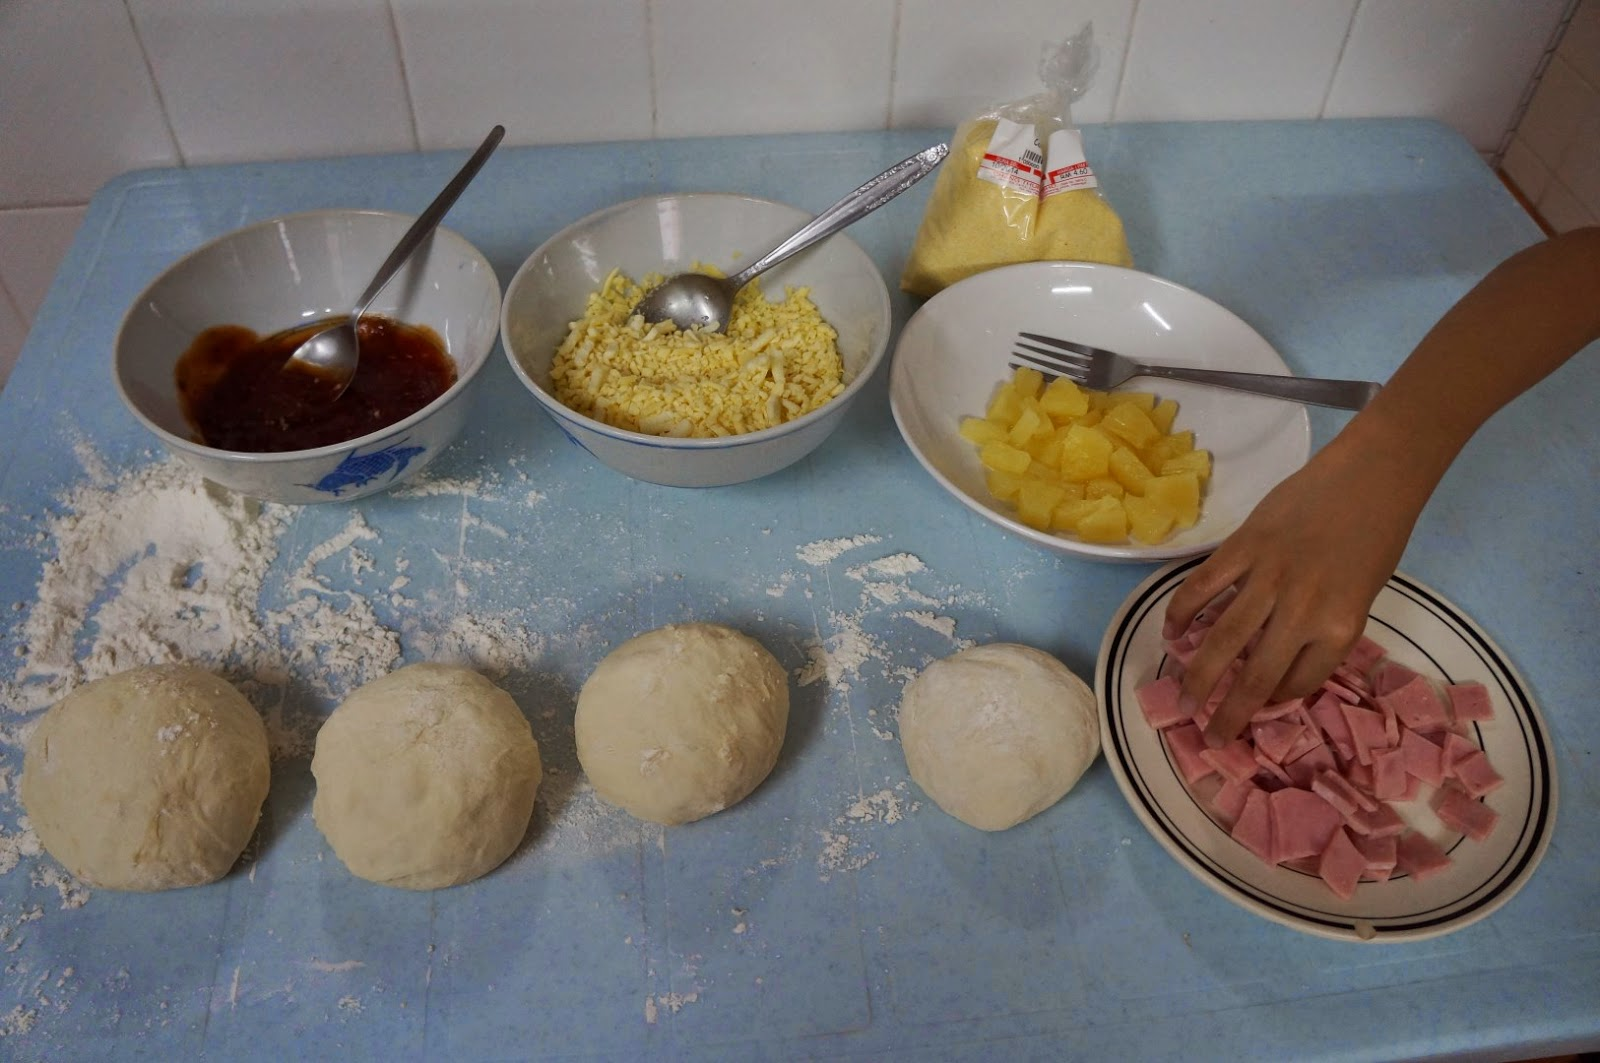 Jim Lahey's No Knead Pizza Dough Ingredients